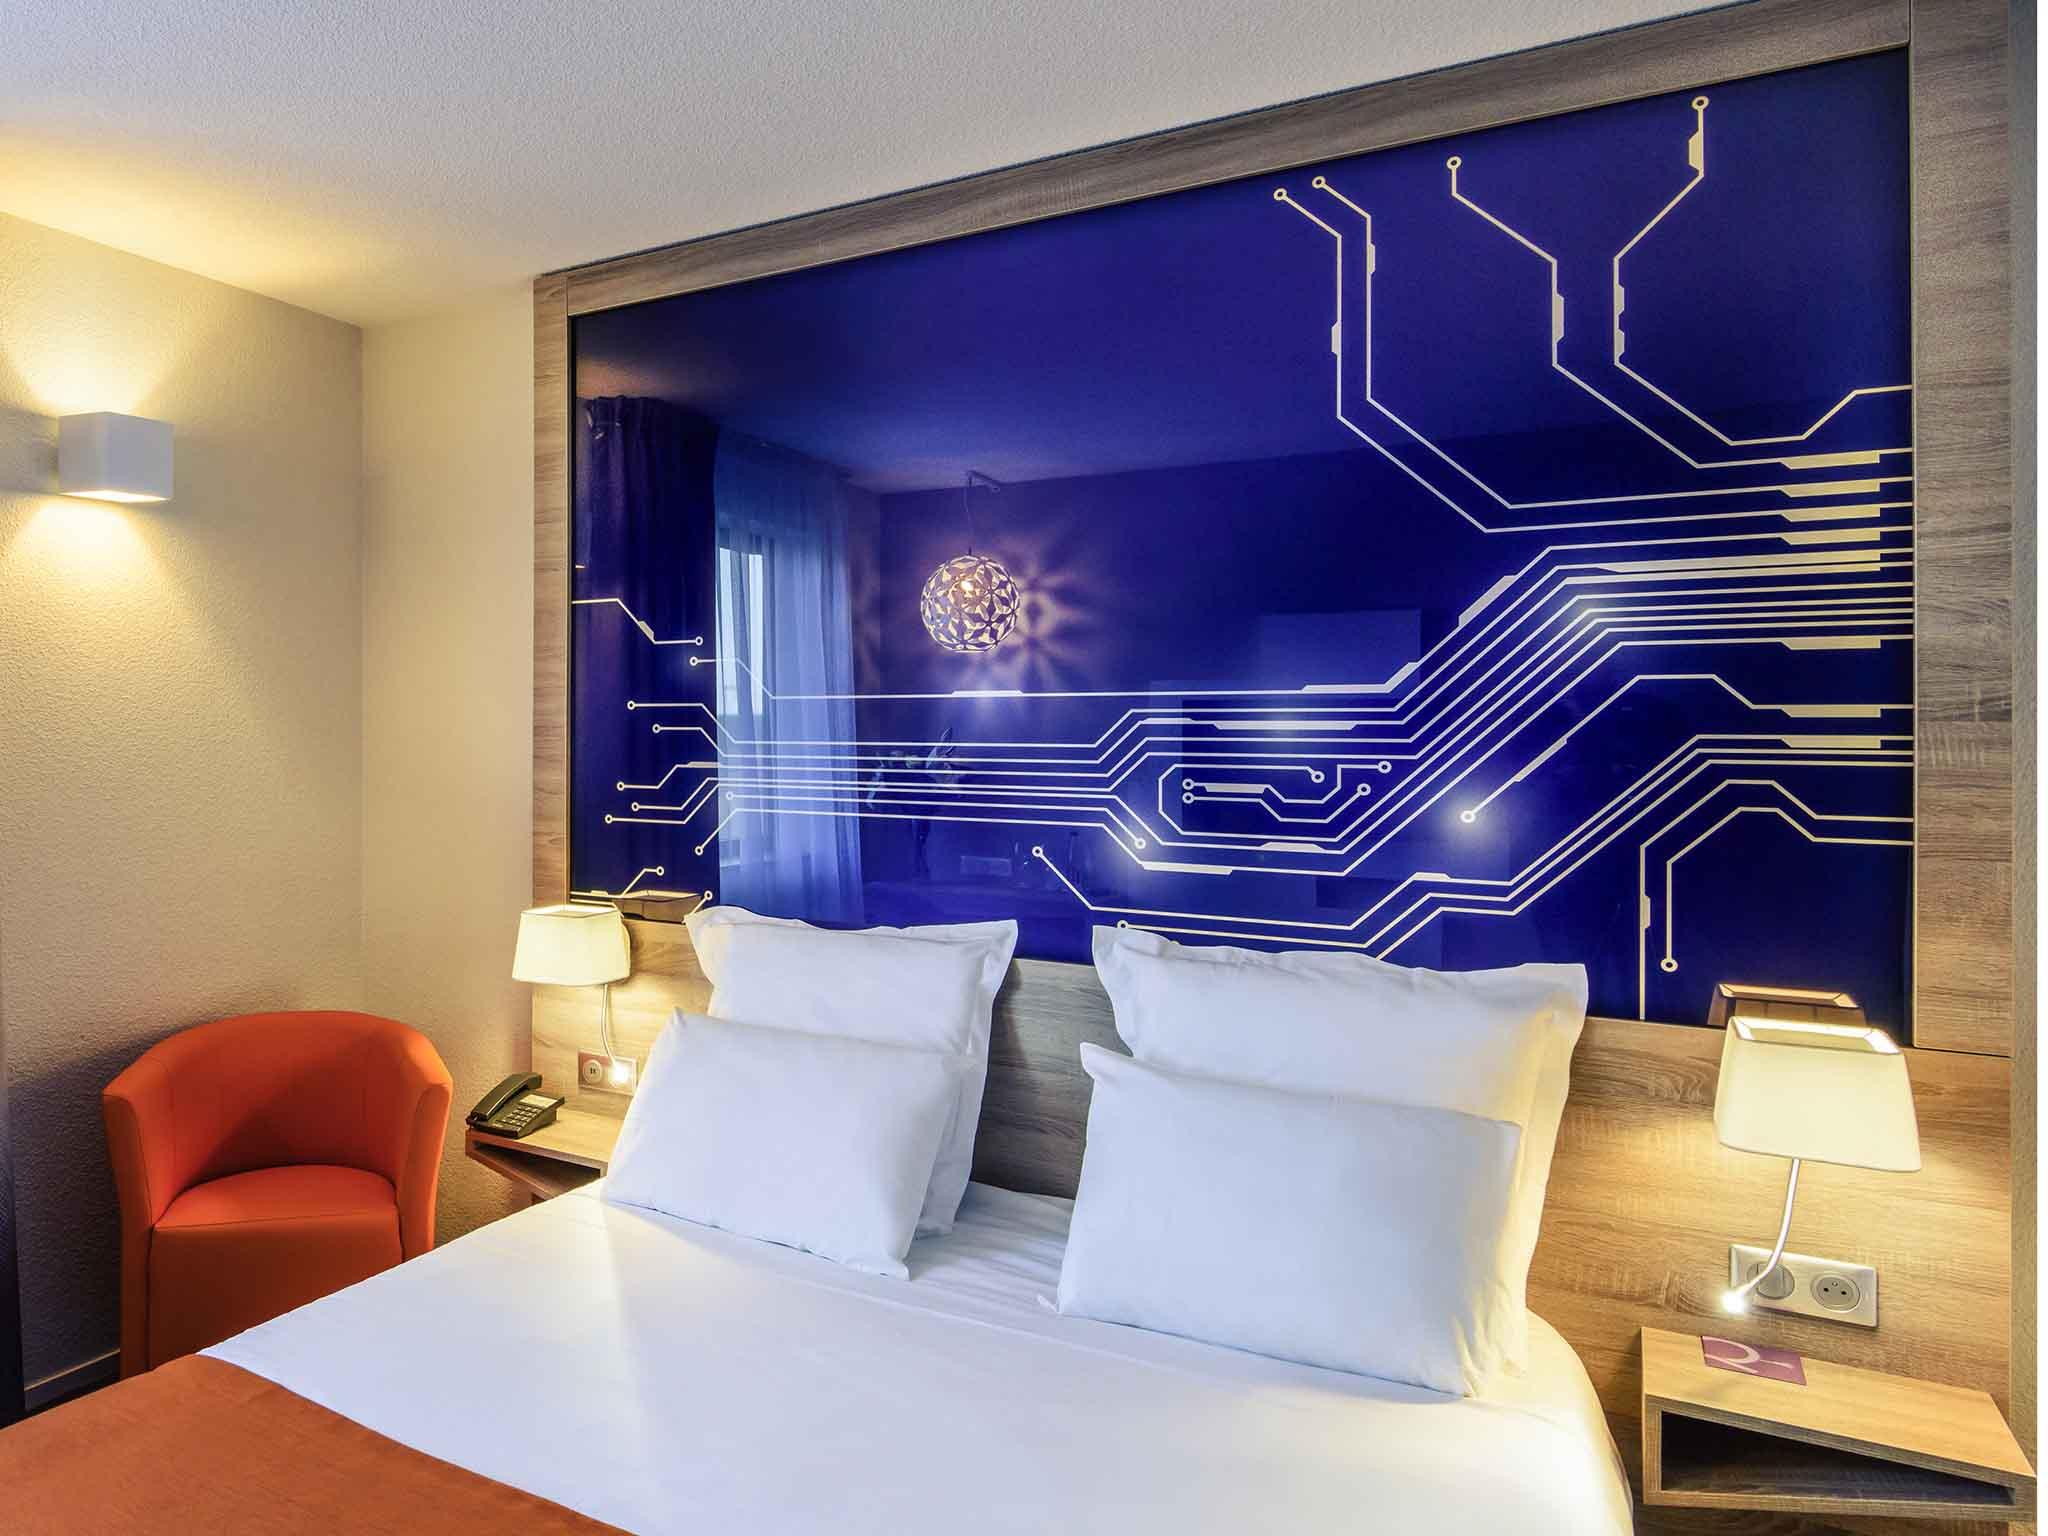 Hotel – Albergo Mercure Poitiers Site du Futuroscope